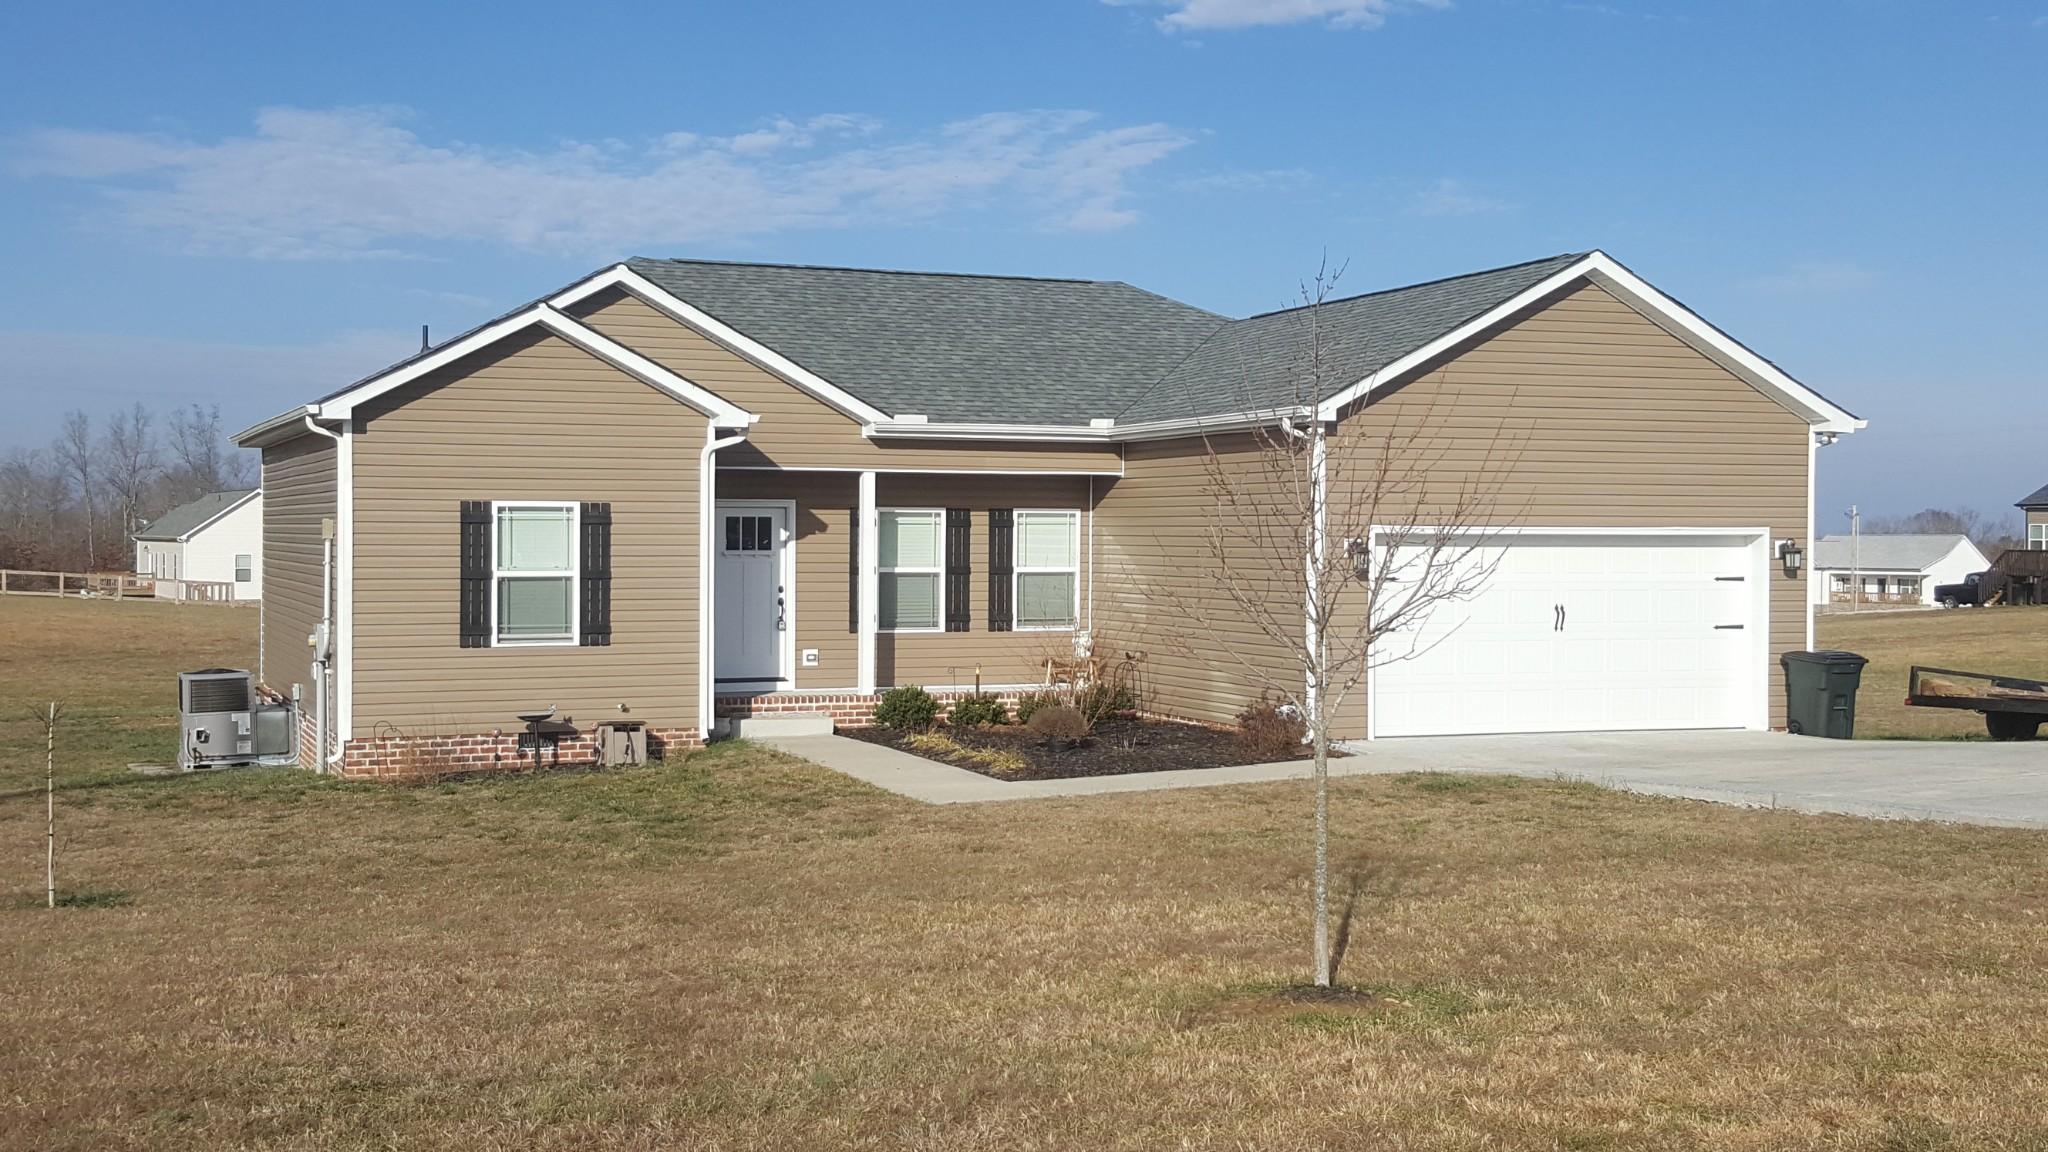 1063 Shelton Rd Property Photo - Charlotte, TN real estate listing